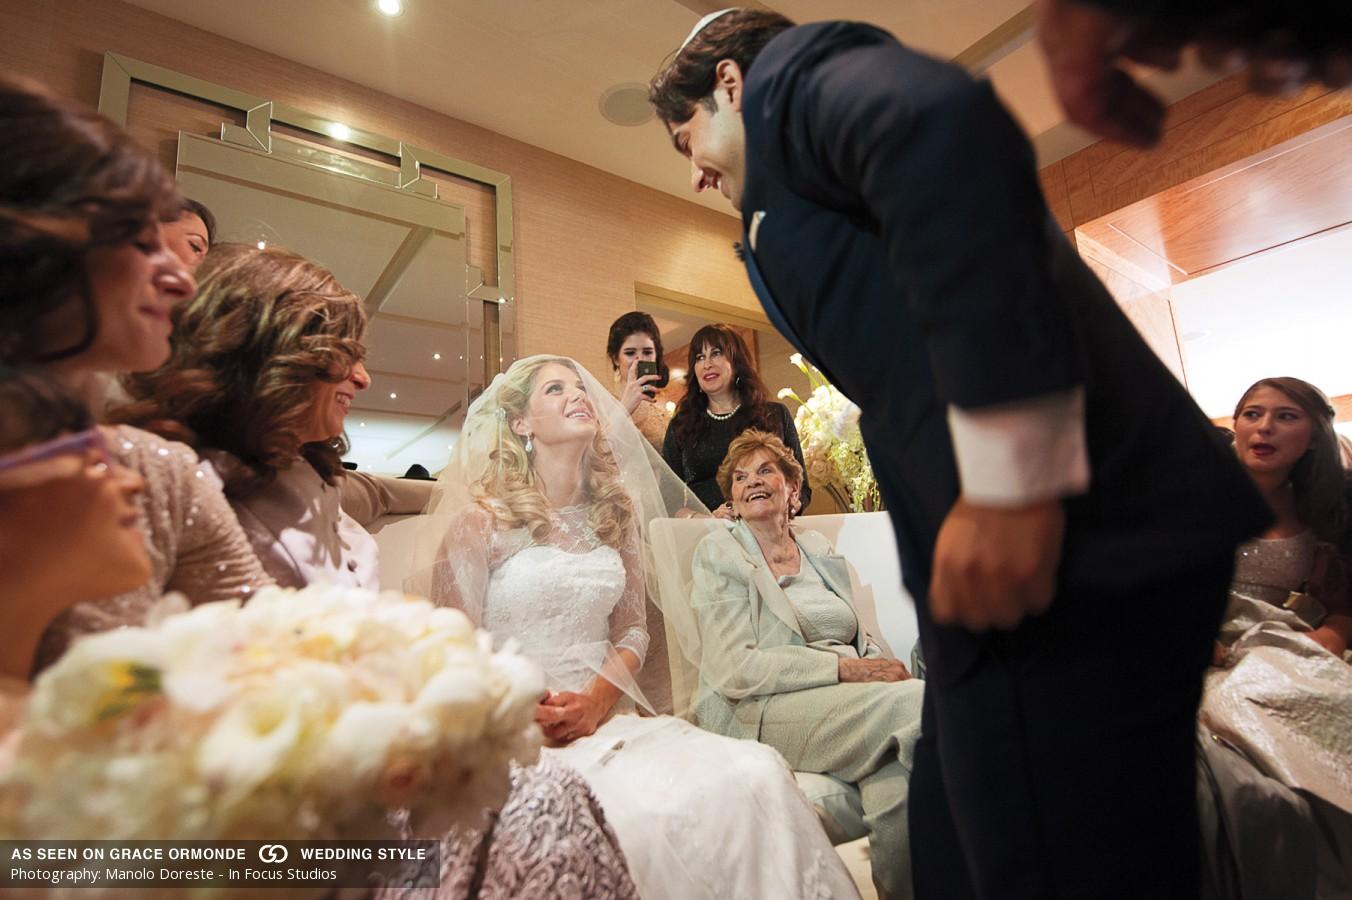 manolo-doreste-wedding-ss14-007.jpg